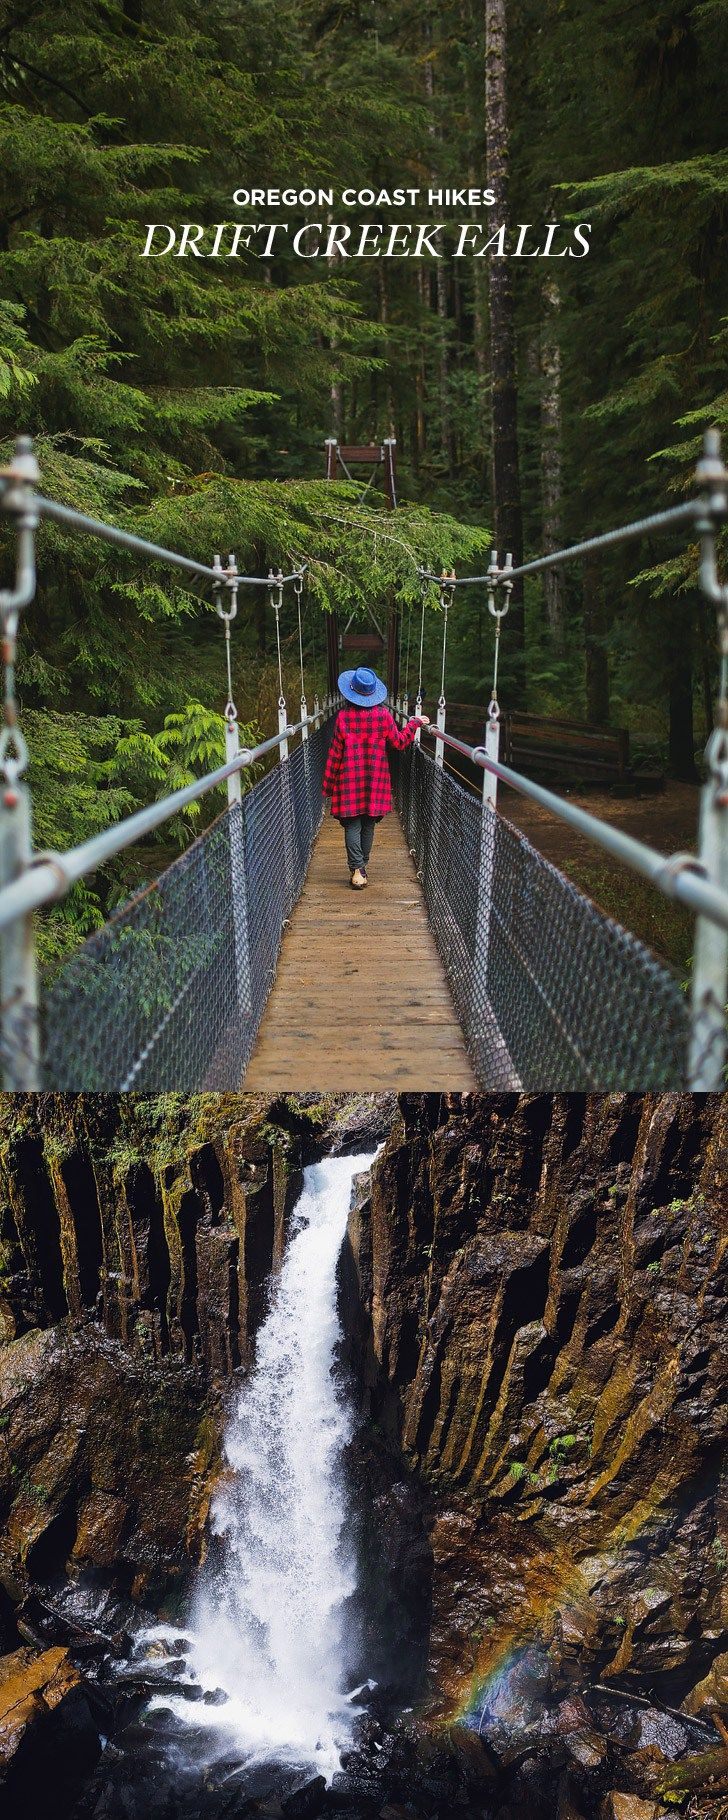 Photo Guide to Drift Creek Falls - Oregon Hikes, Lincoln City, Oregon Coast // localadventurer.com